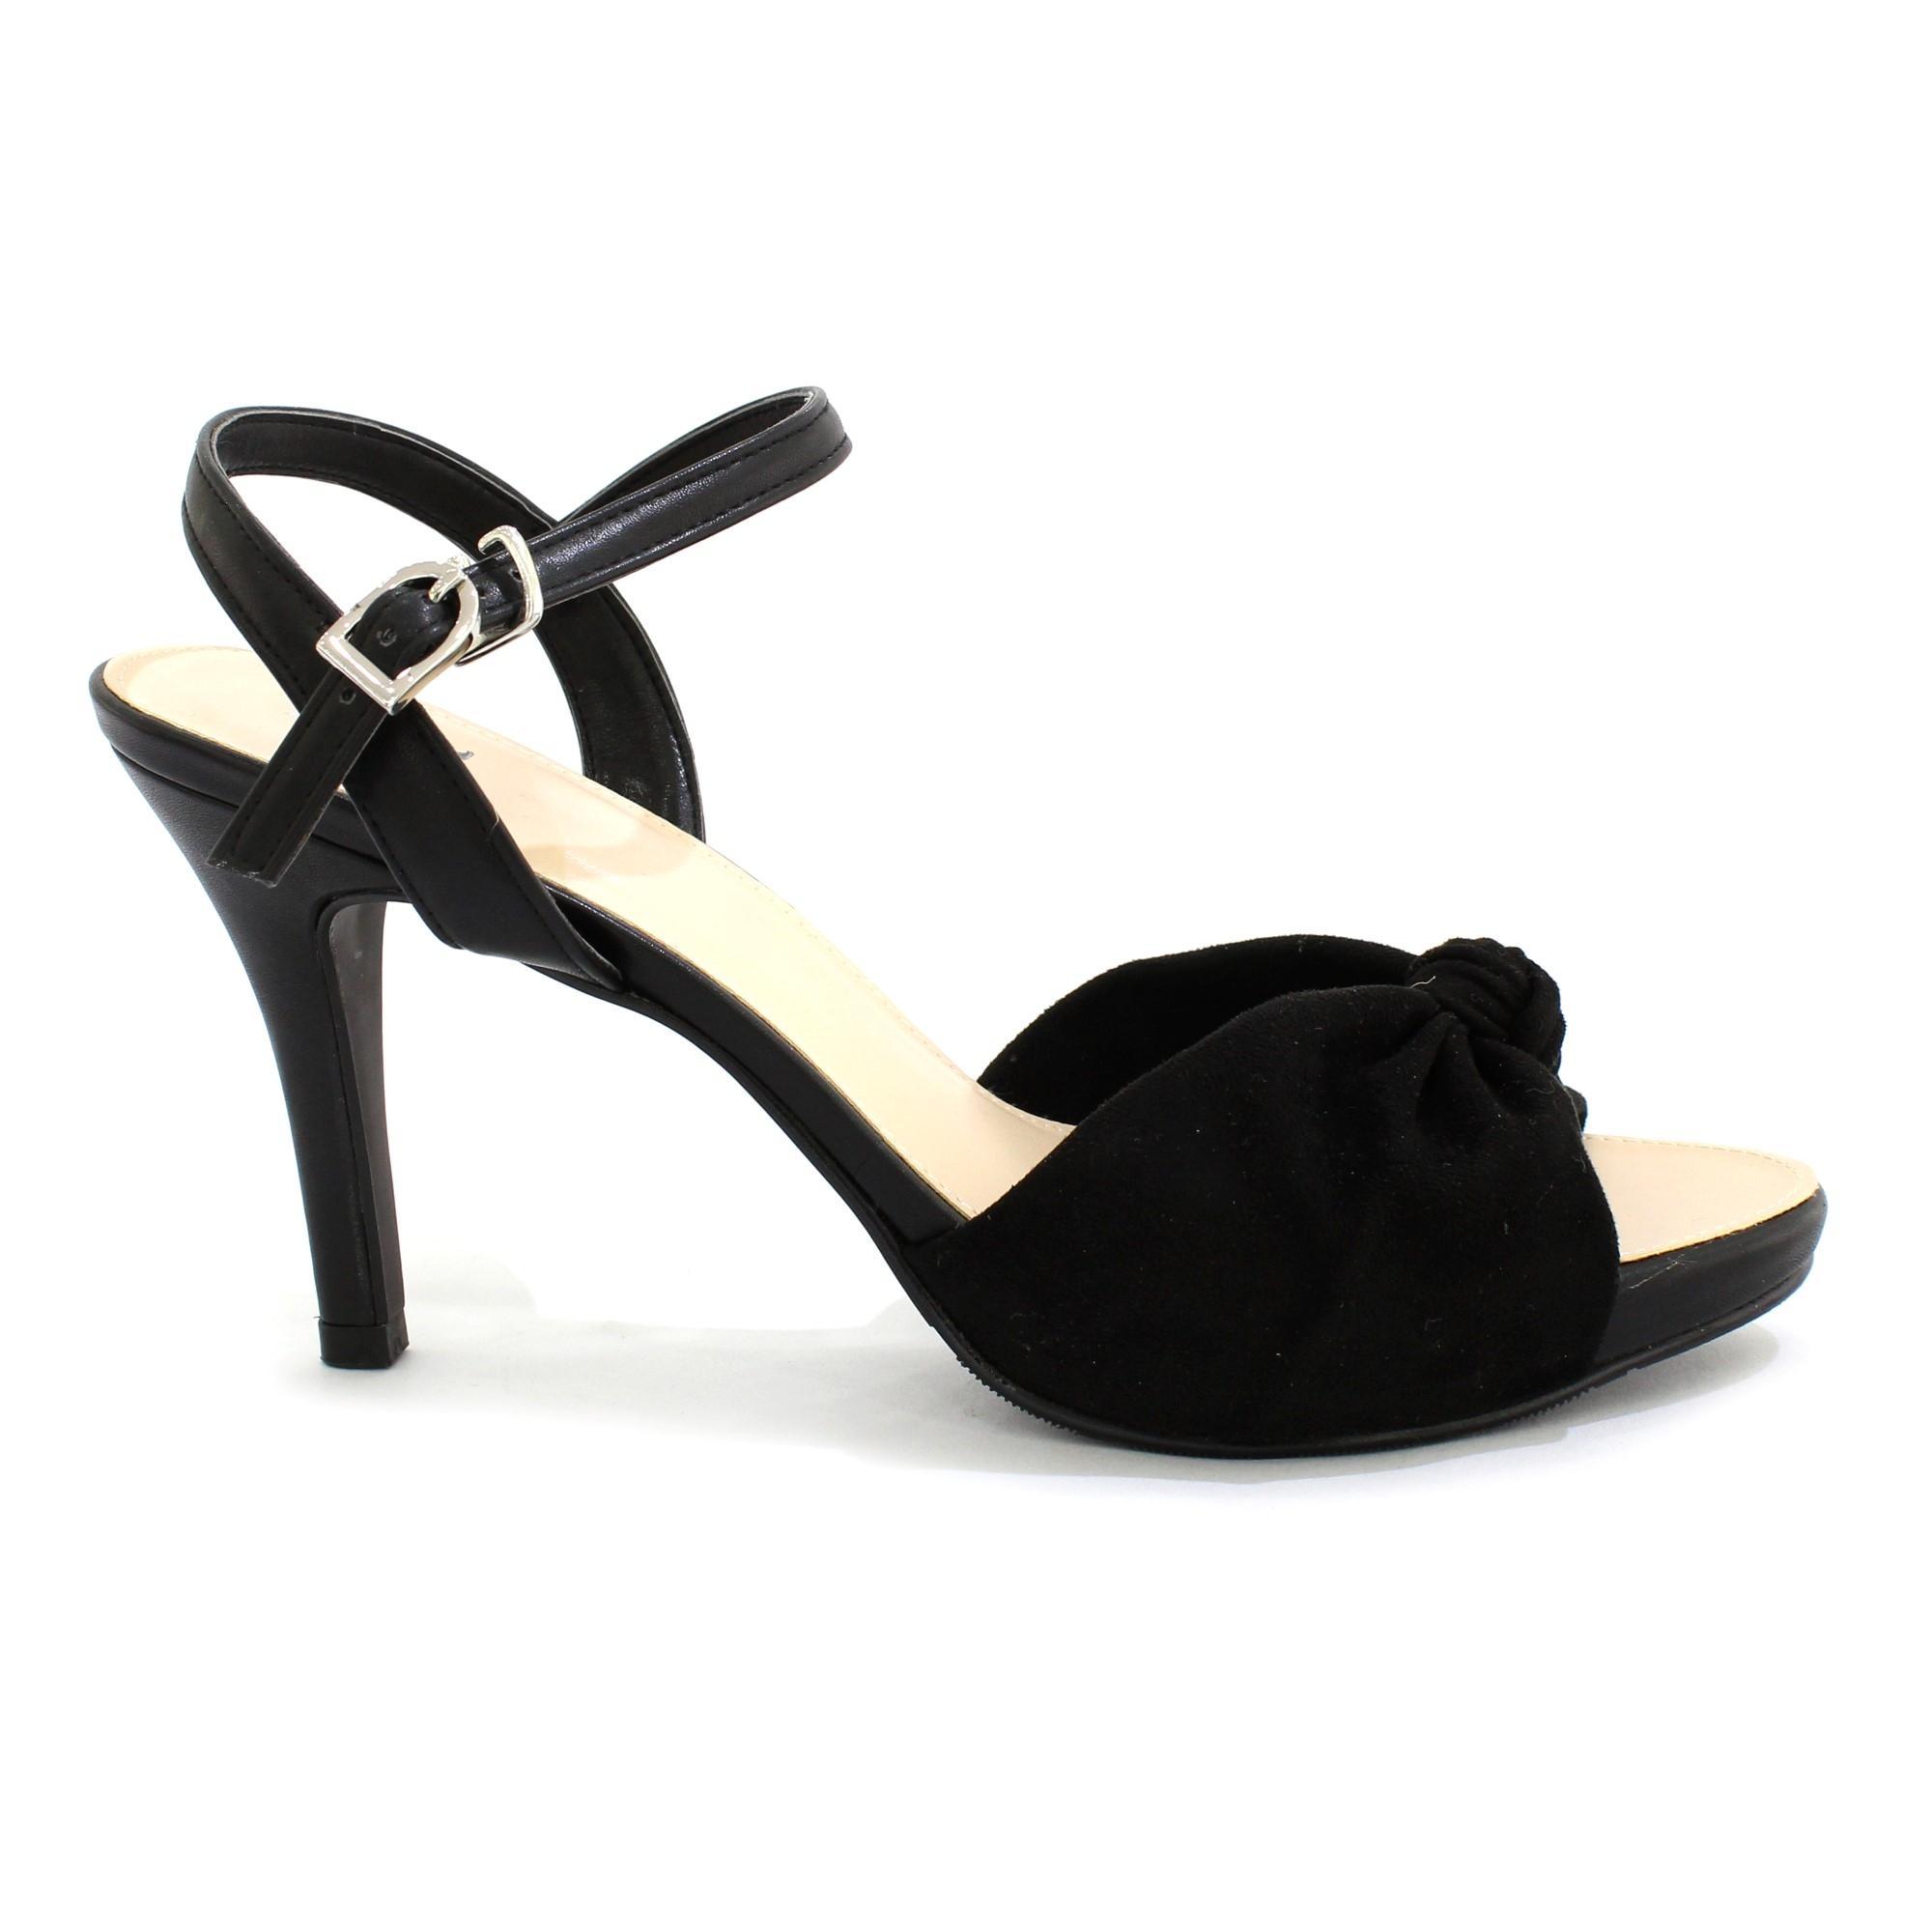 245680e6073f DMK Black Bow Designed Ankle Strap Heel Shoes For Women - 15425